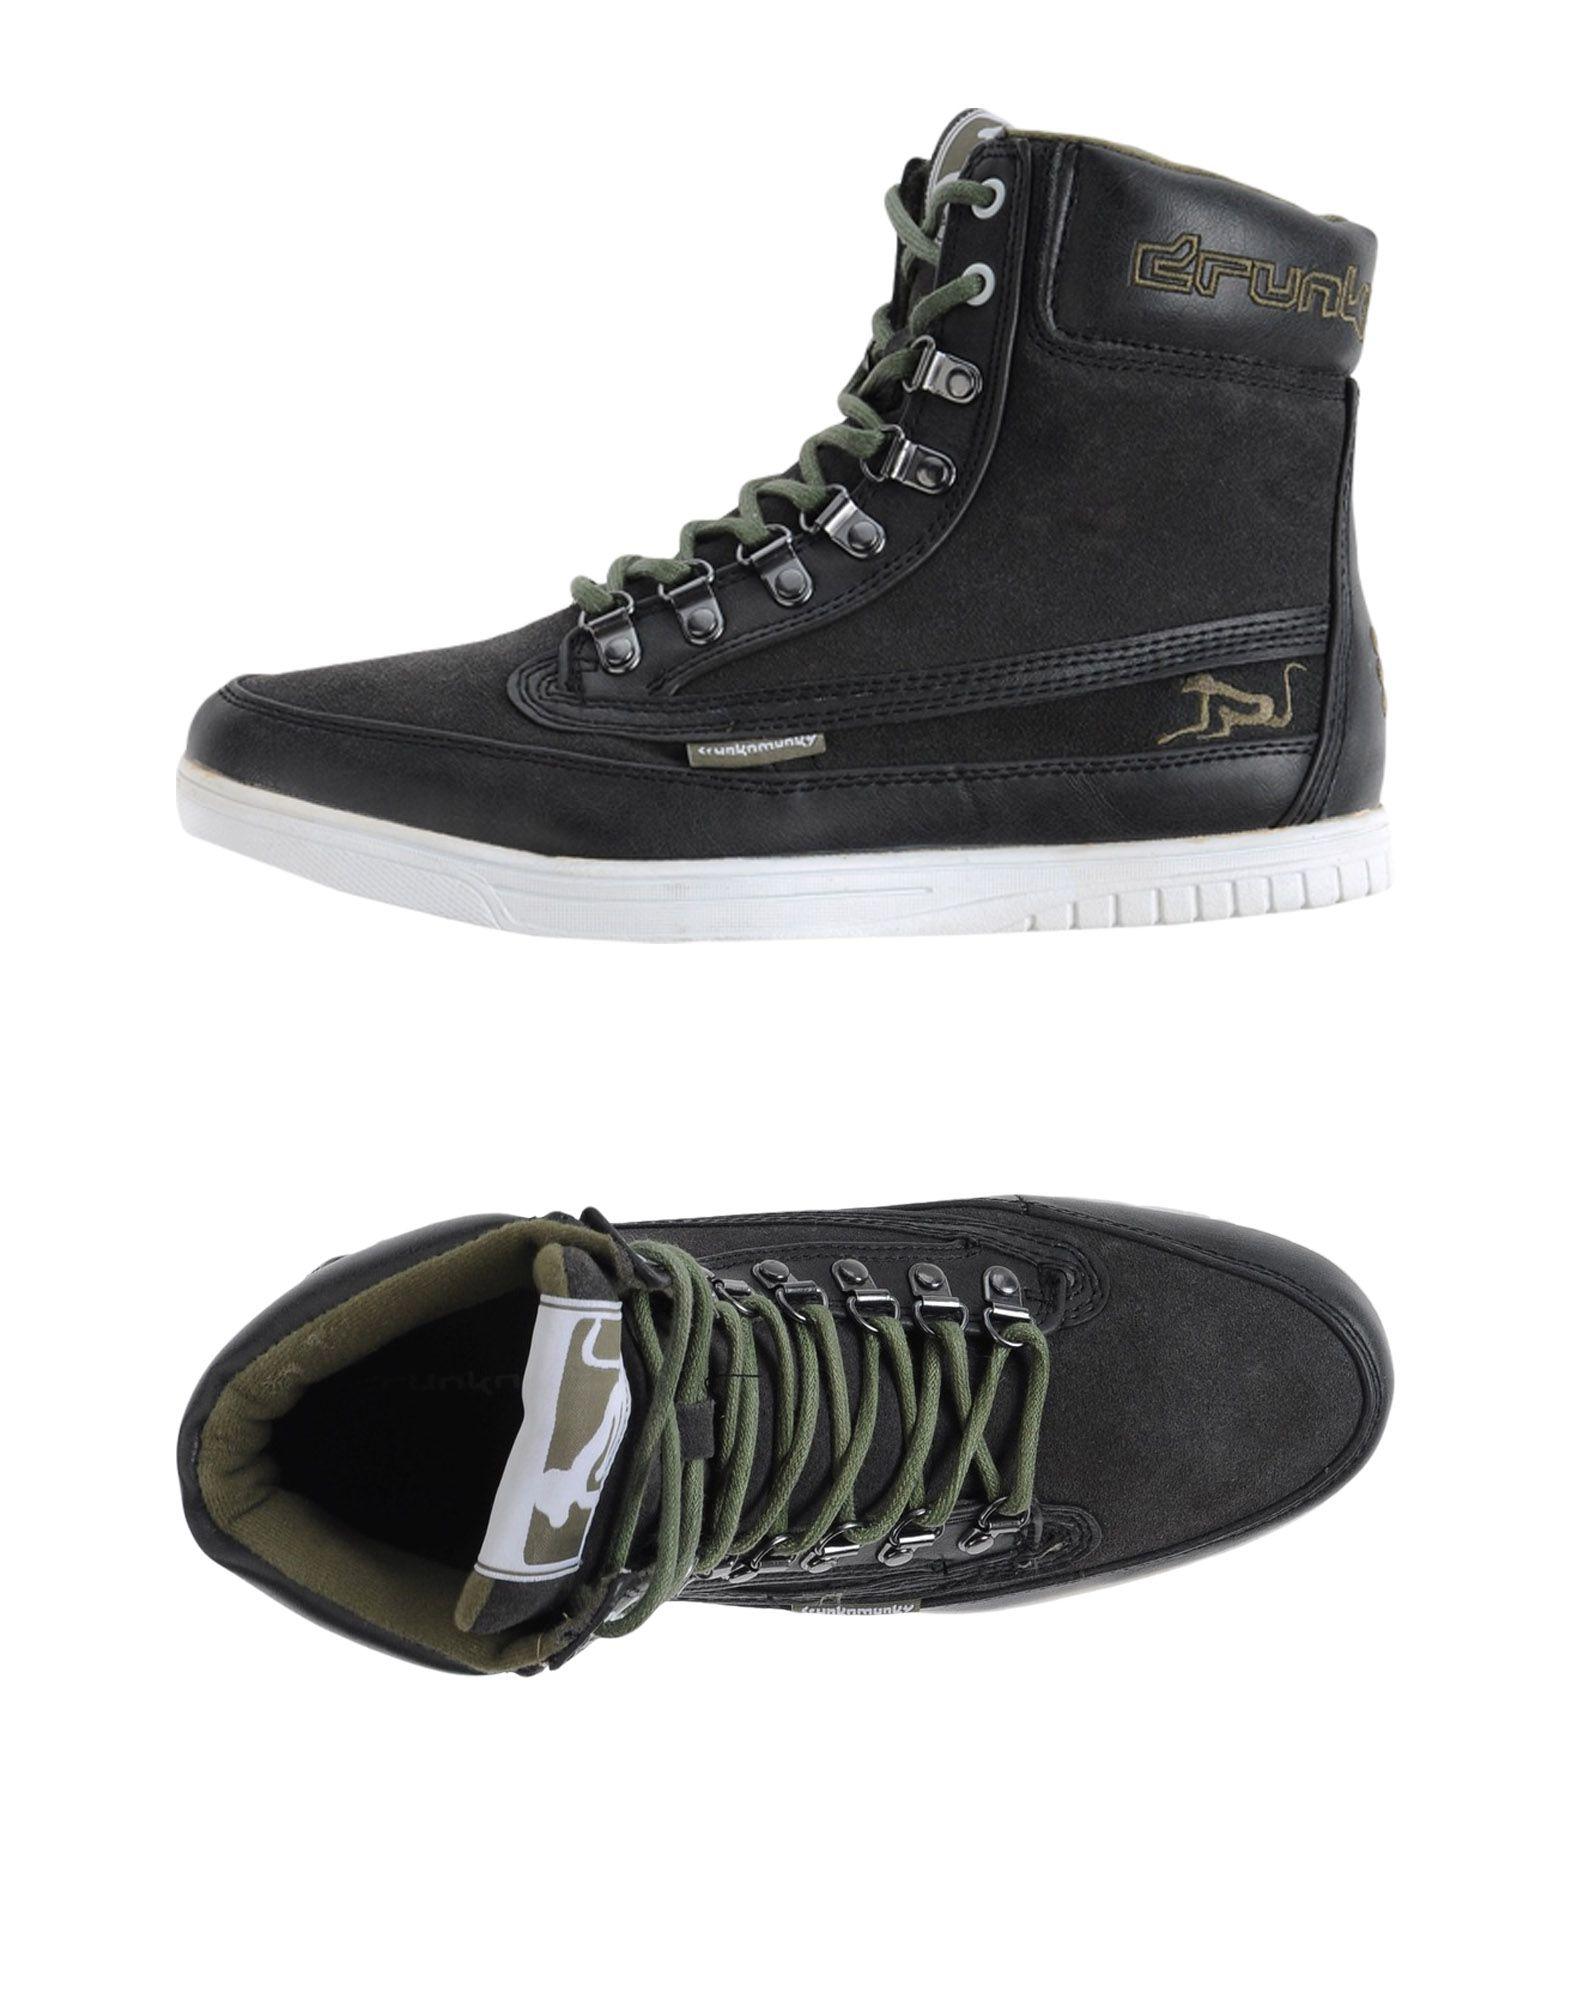 A buon mercato Sneakers Drunknmunky Uomo - 11345144WP